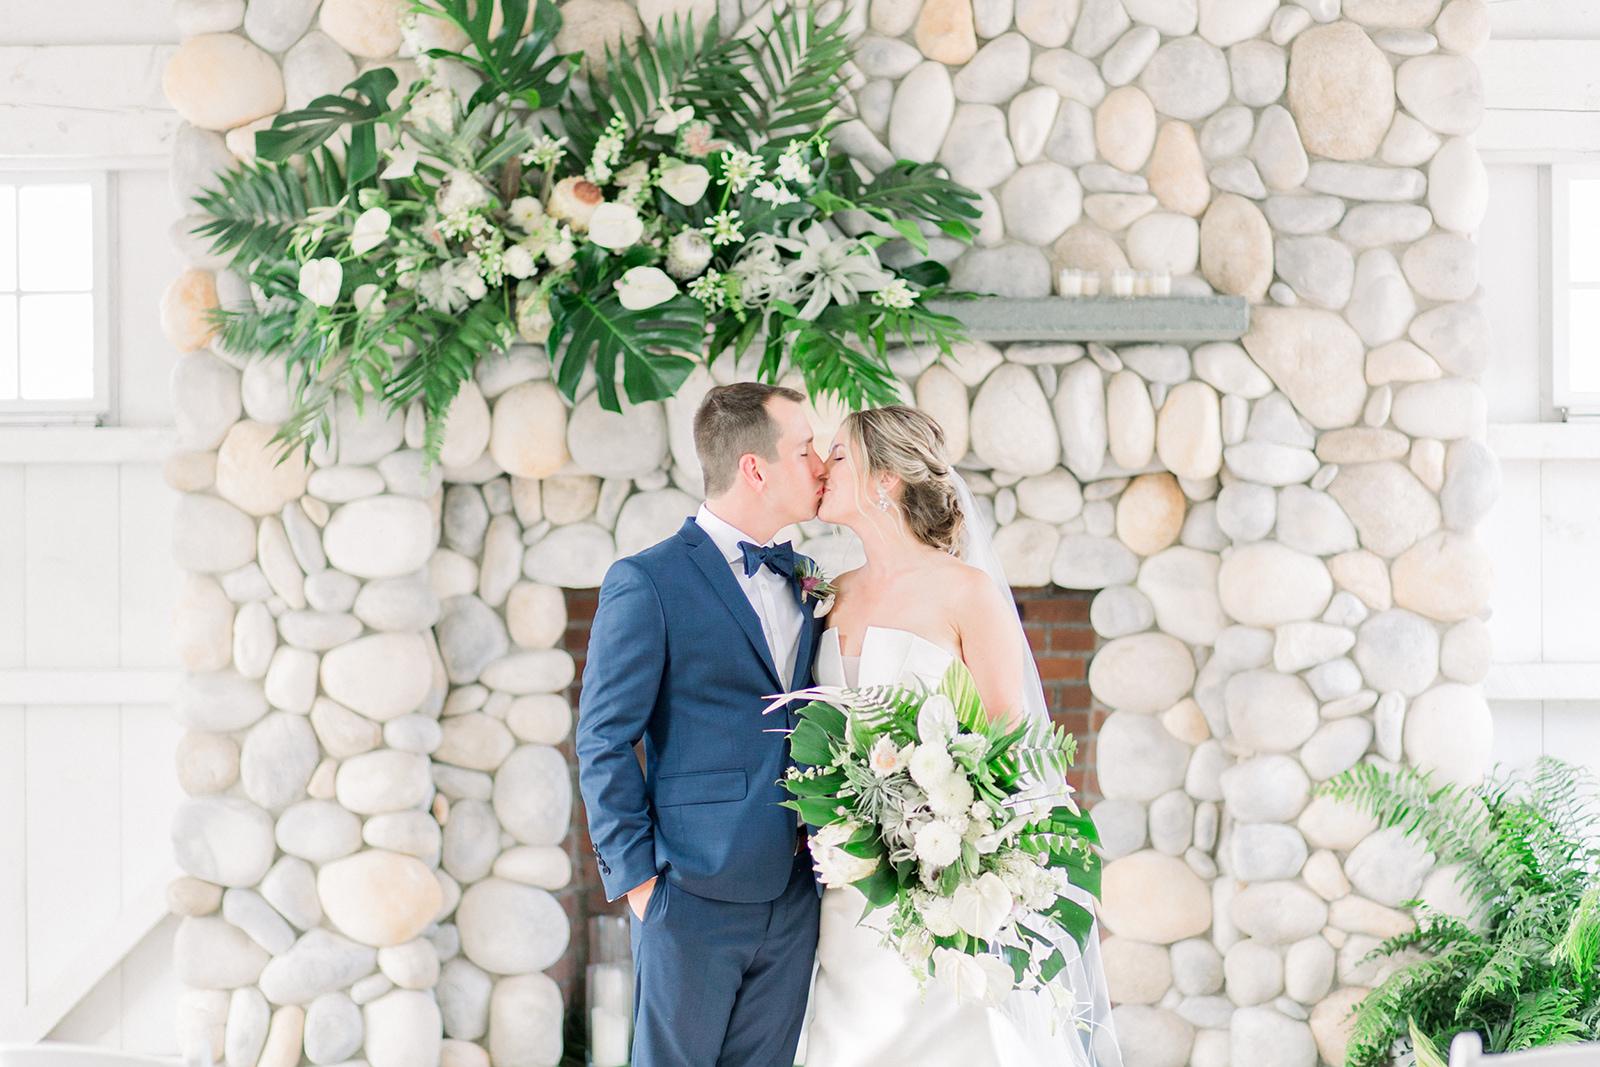 Lara_Arthur_8.18.2018_Wedding-260.jpg